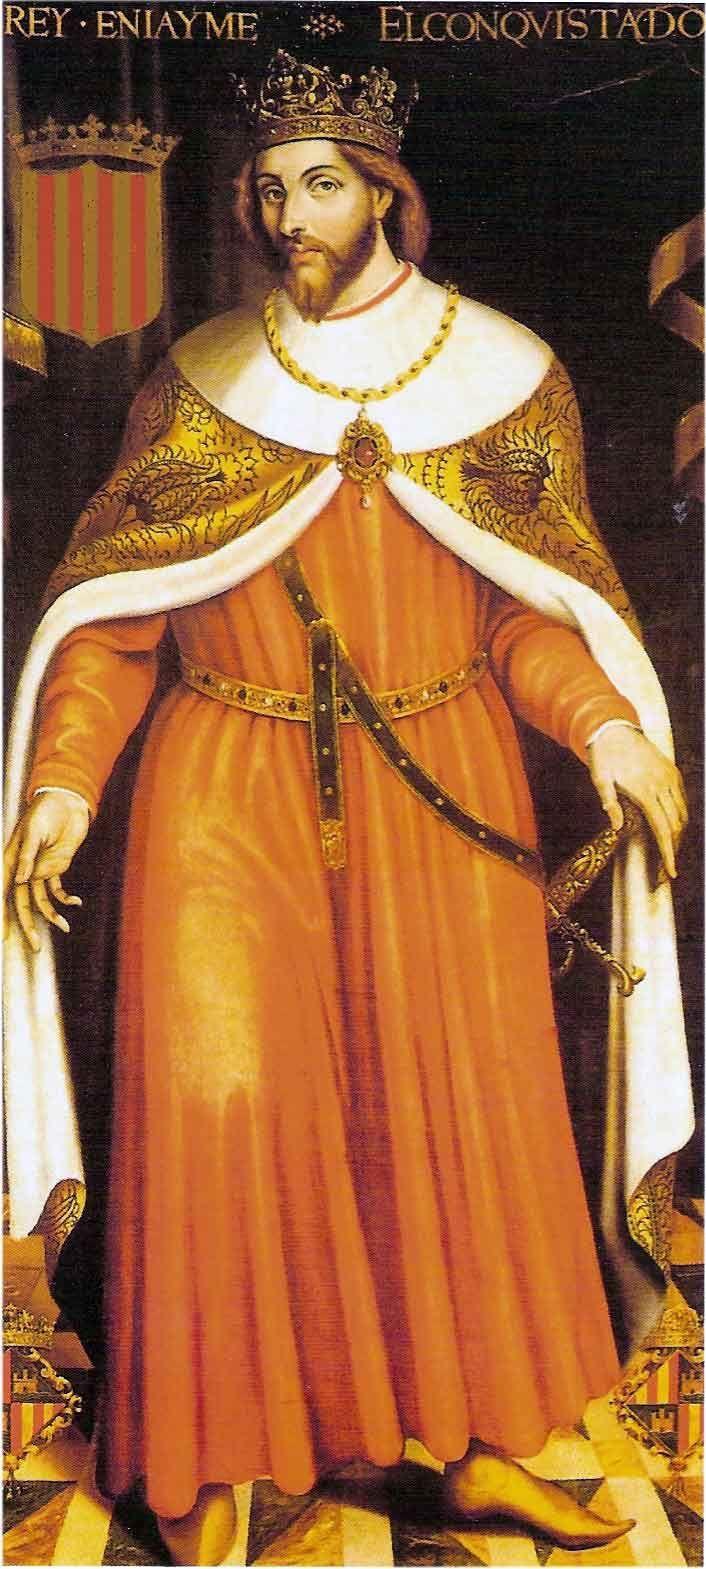 ¿En qué fecha Jaime I conquistó Mallorca?